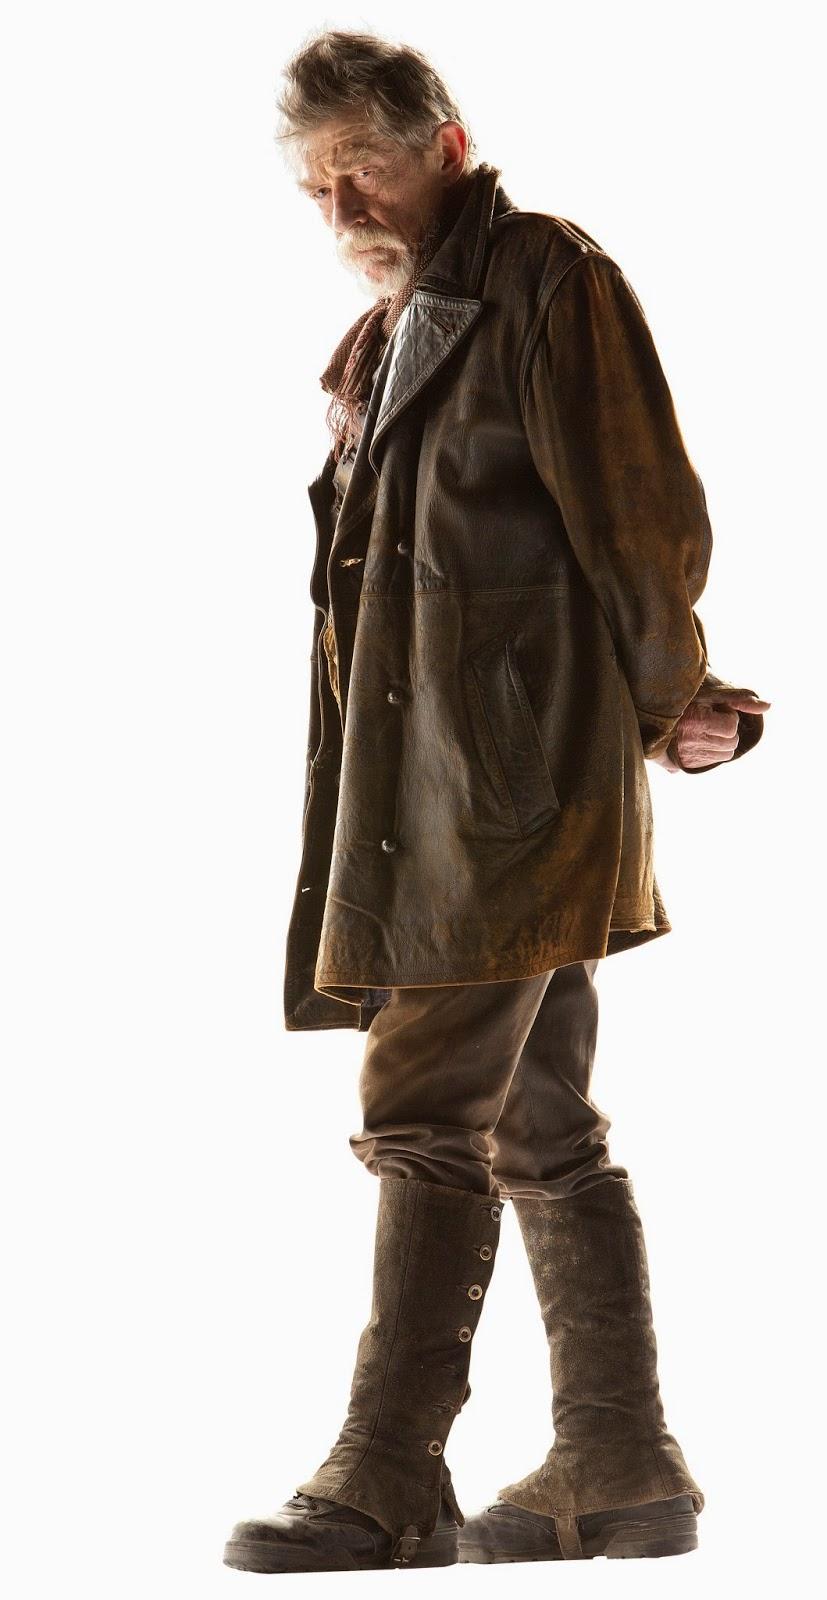 Another publicity shot of John Hurt as the War Doctor